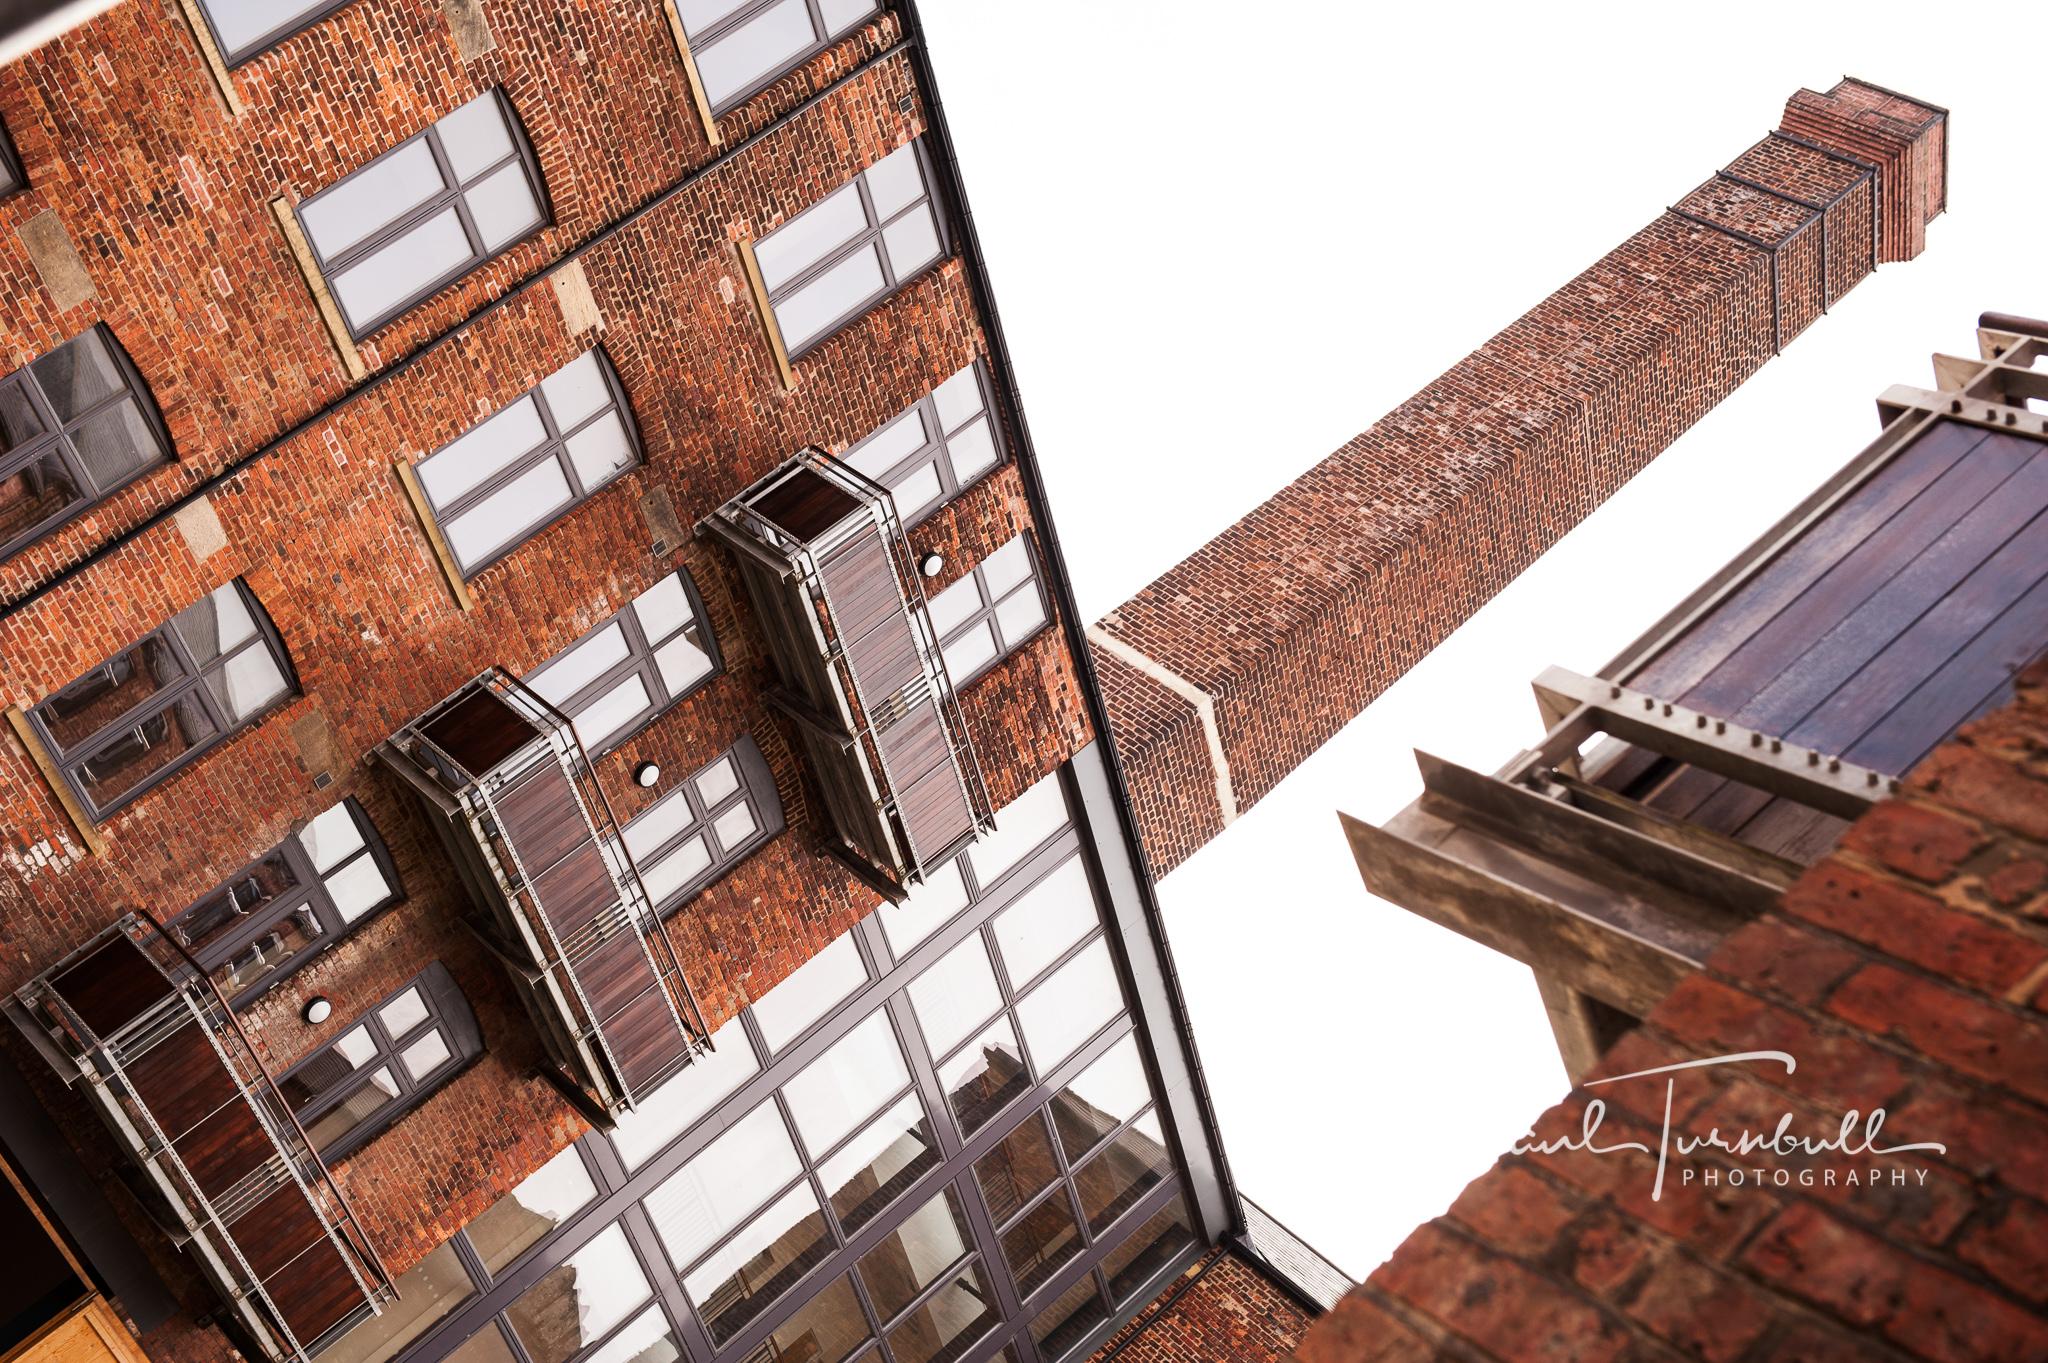 commercial-property-photographer-leeds-yorkshire-blackbrook-developments-002.jpg